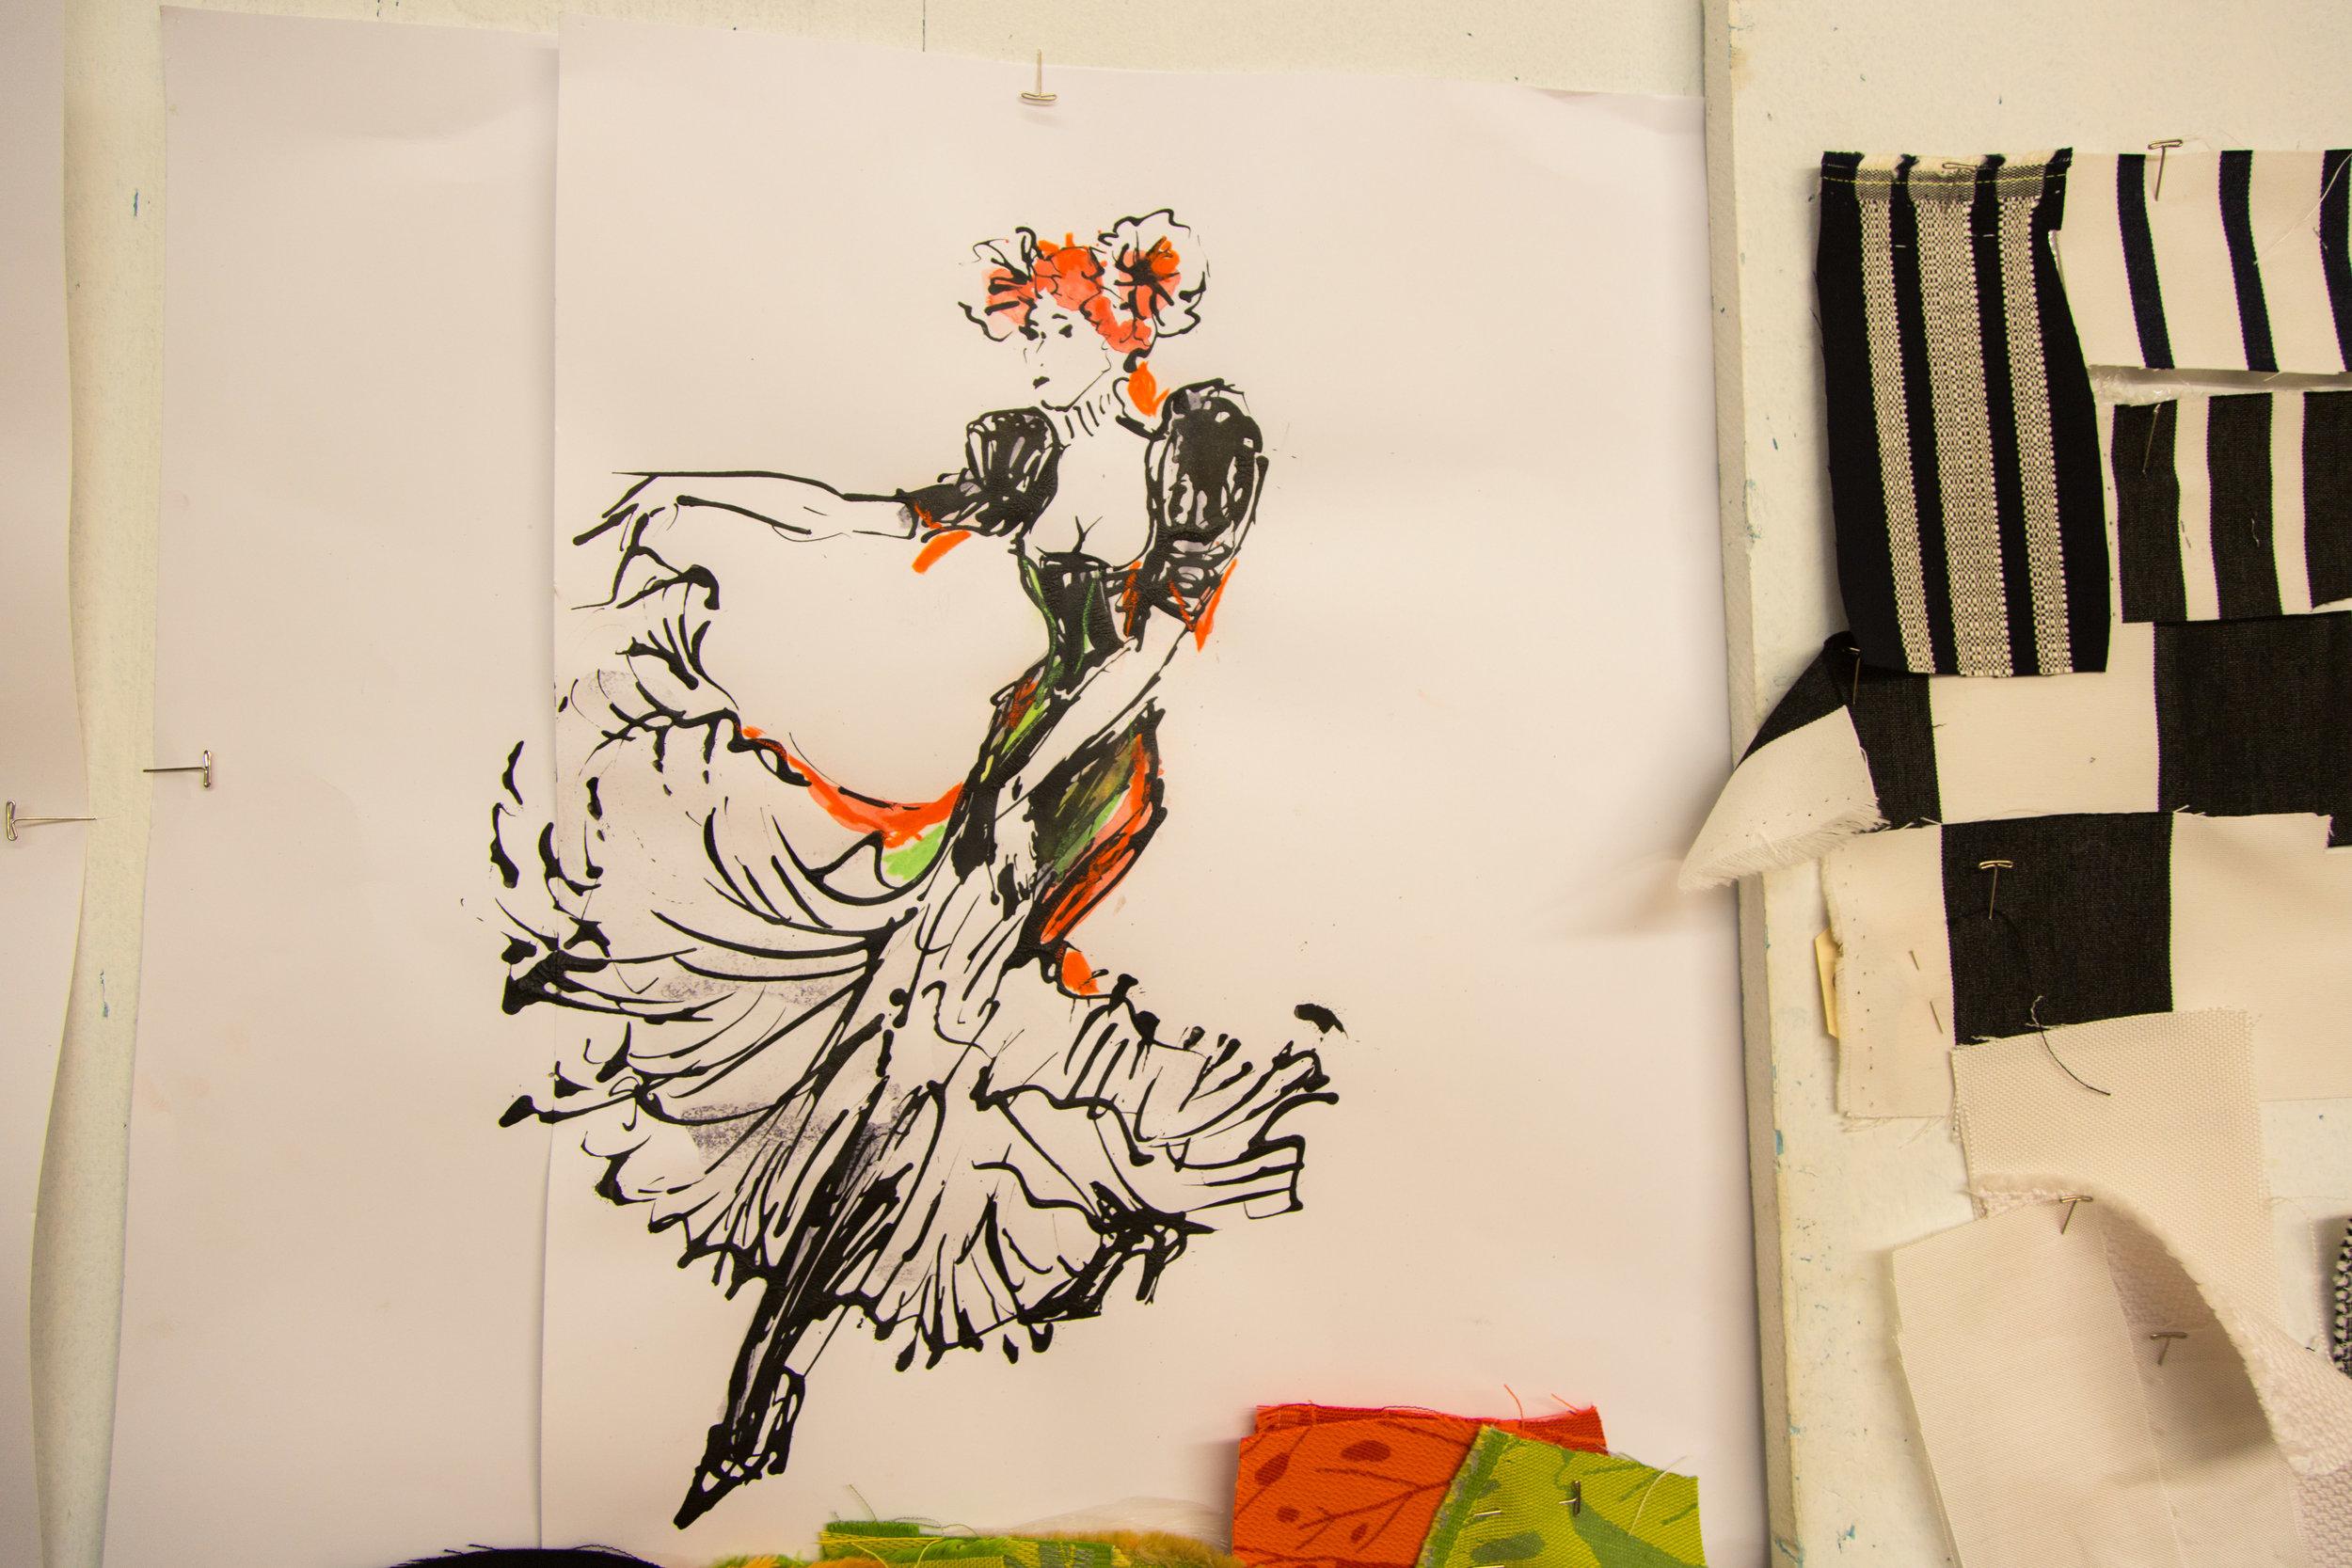 SKETCH INSPIRED BY HENRI DE TOULOUSE-LAUTREC